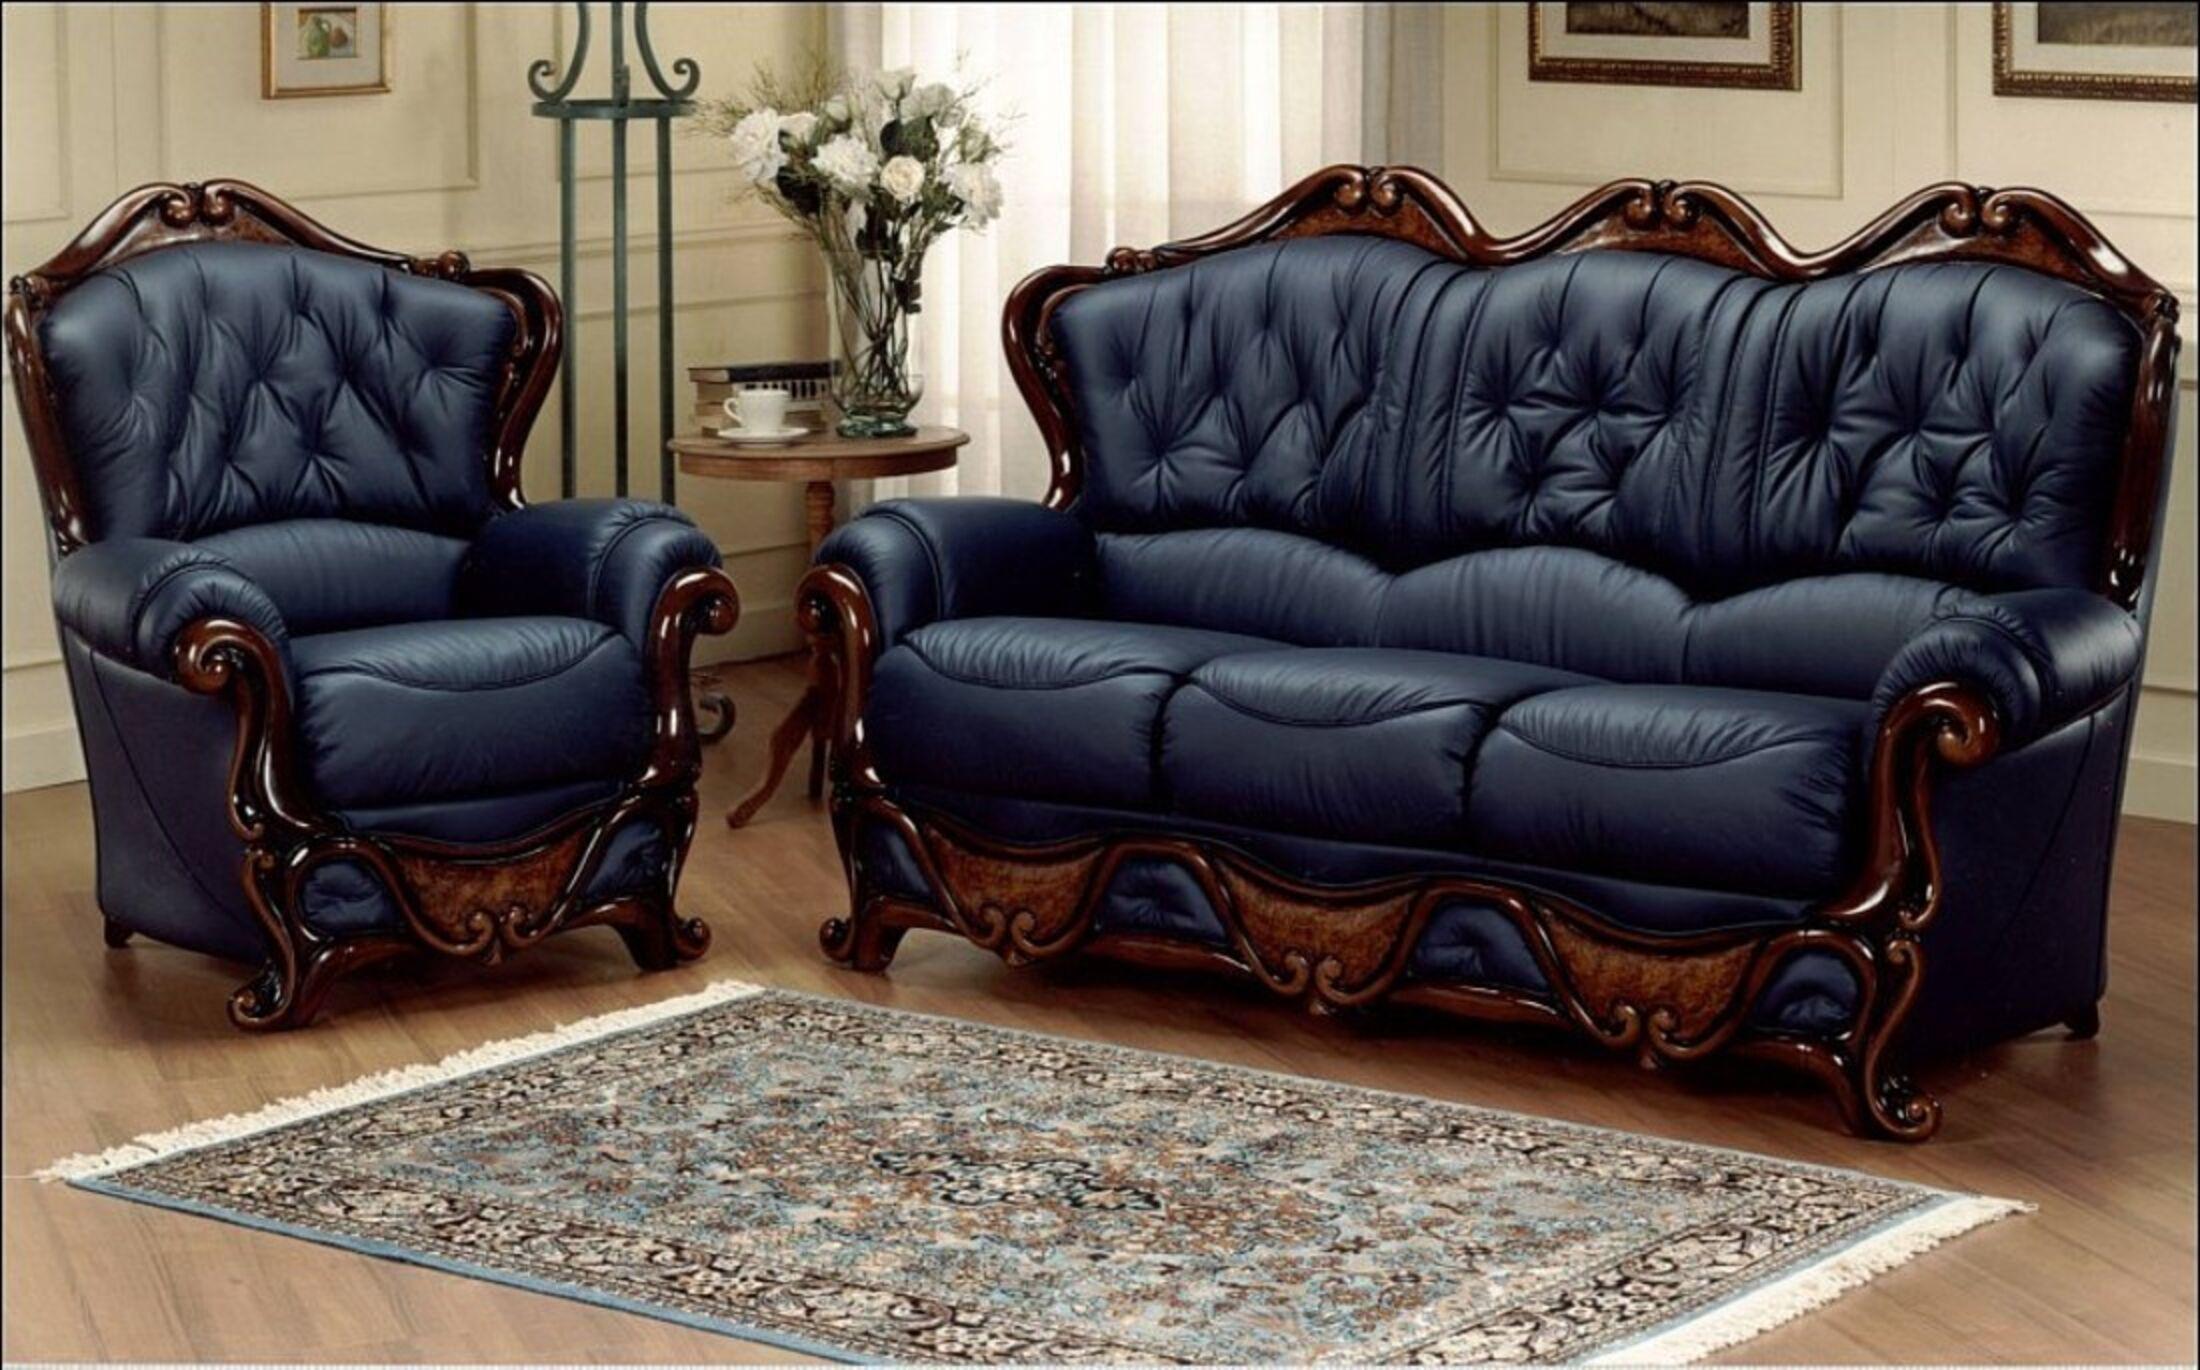 Dante 3 Seater + Armchair Italian Leather Sofa Settee